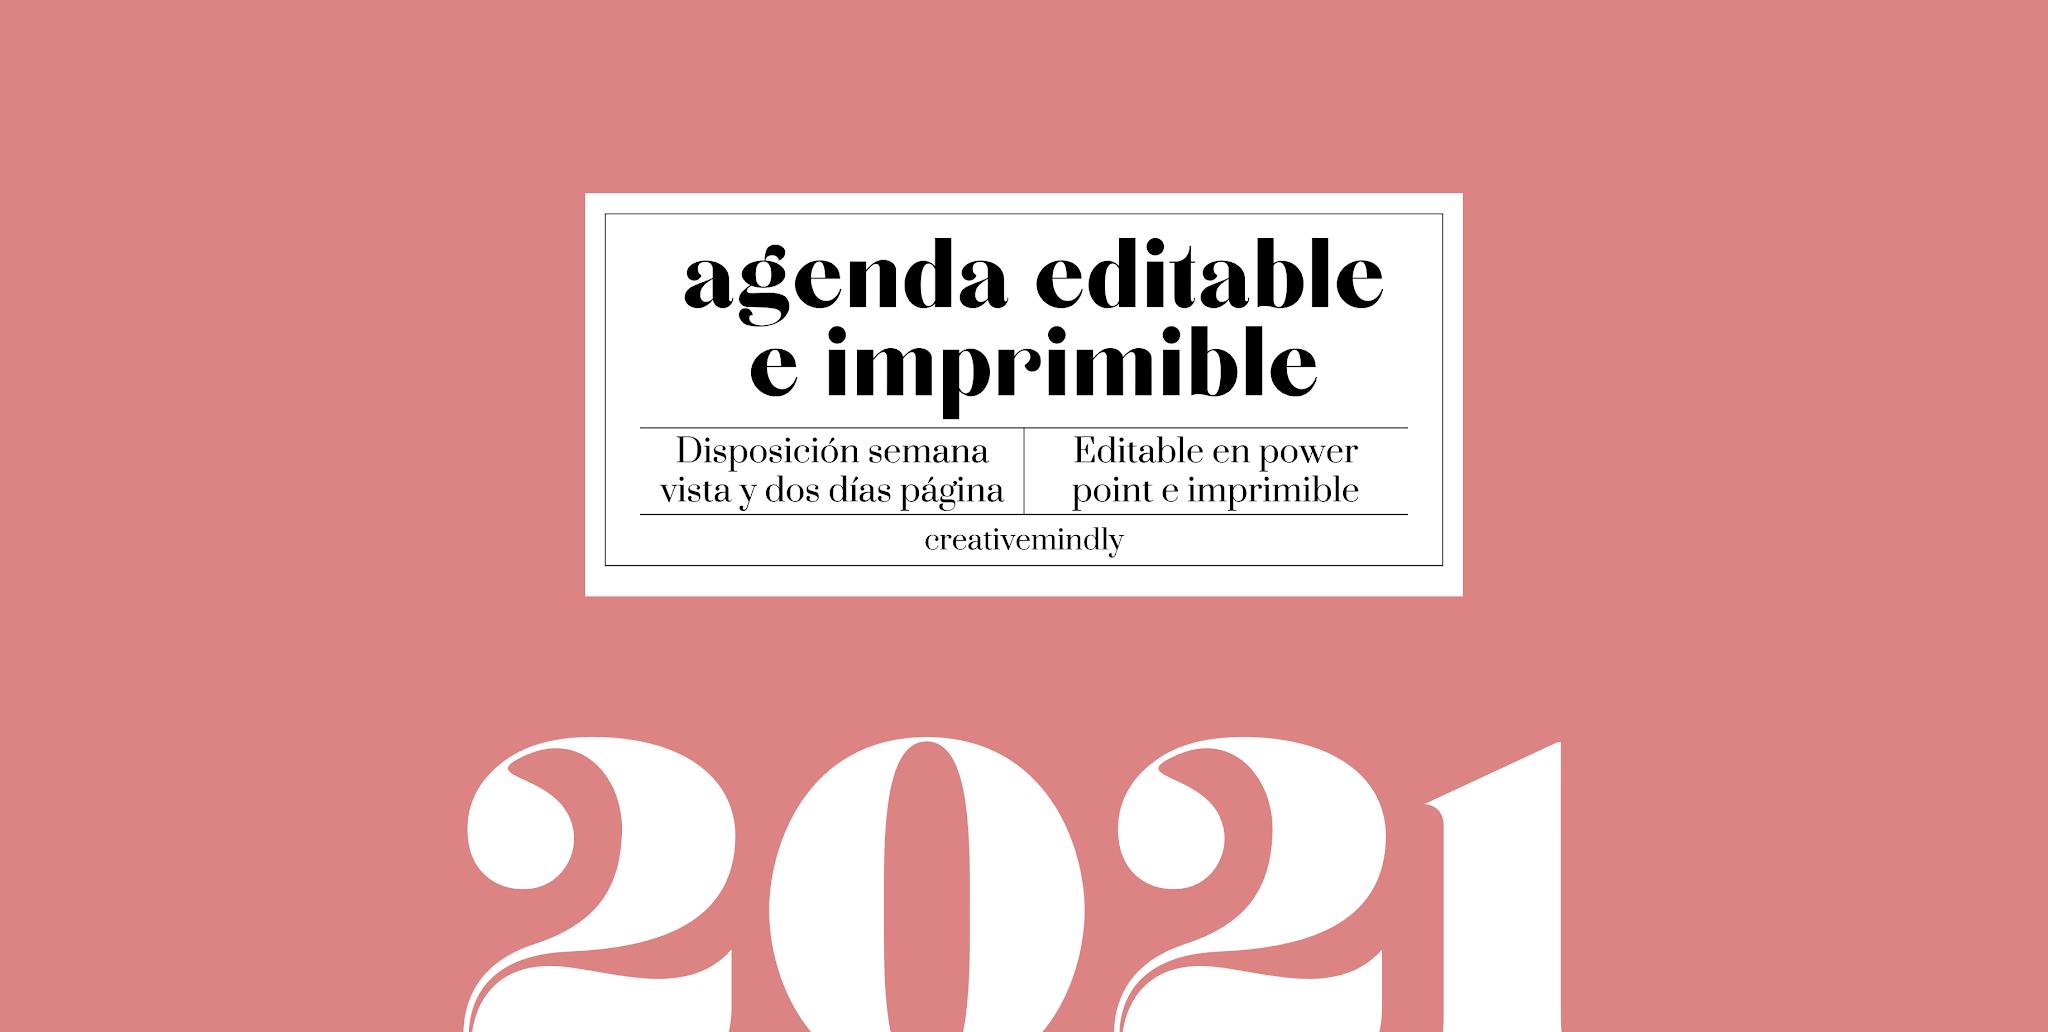 agenda editable imprimible 2021